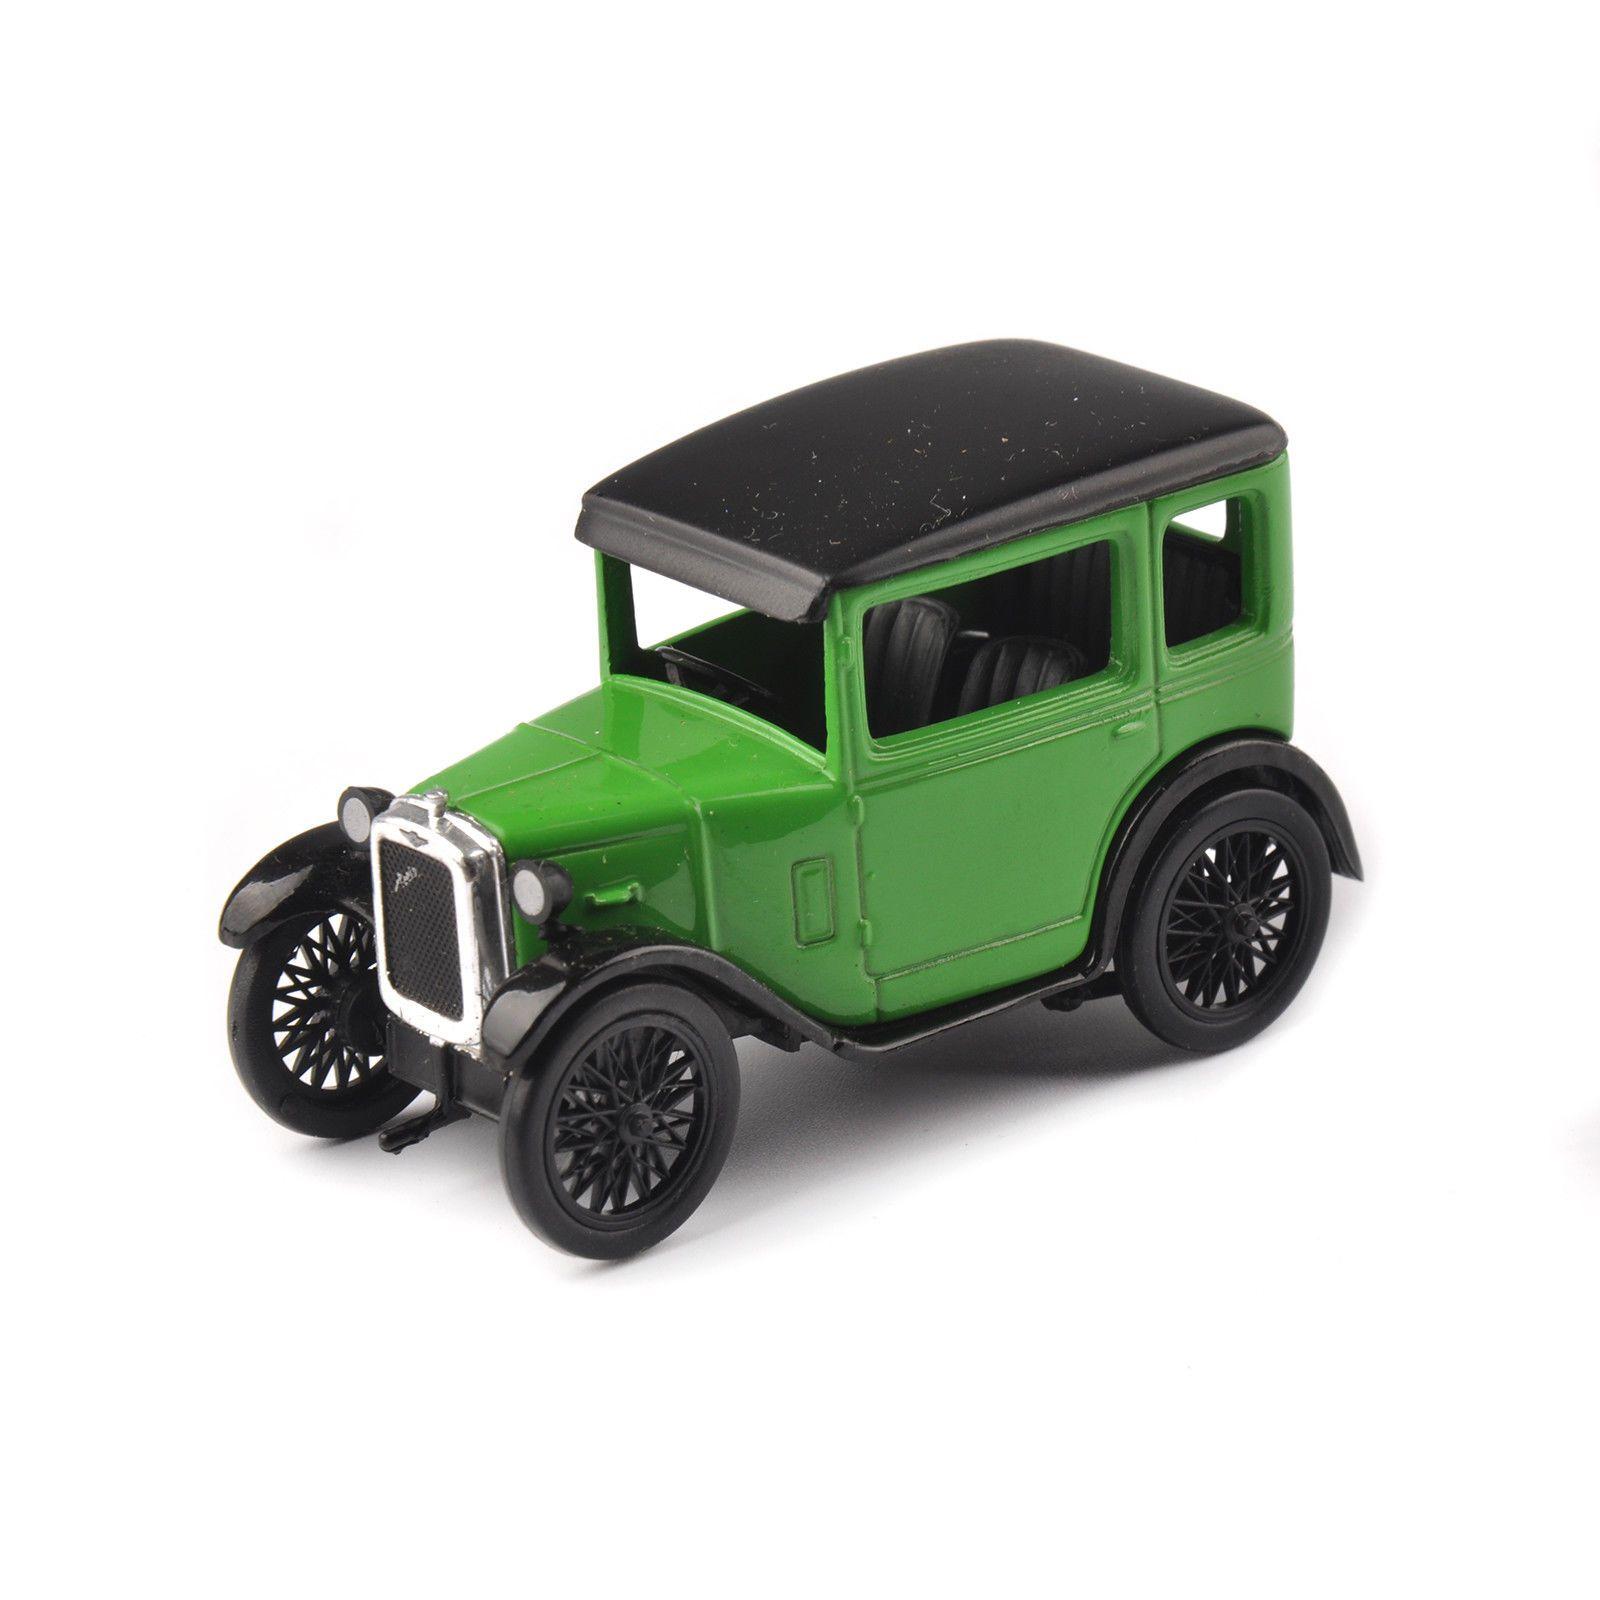 5.99 1/43 Green Oxford Austin Seven Rn Saloon